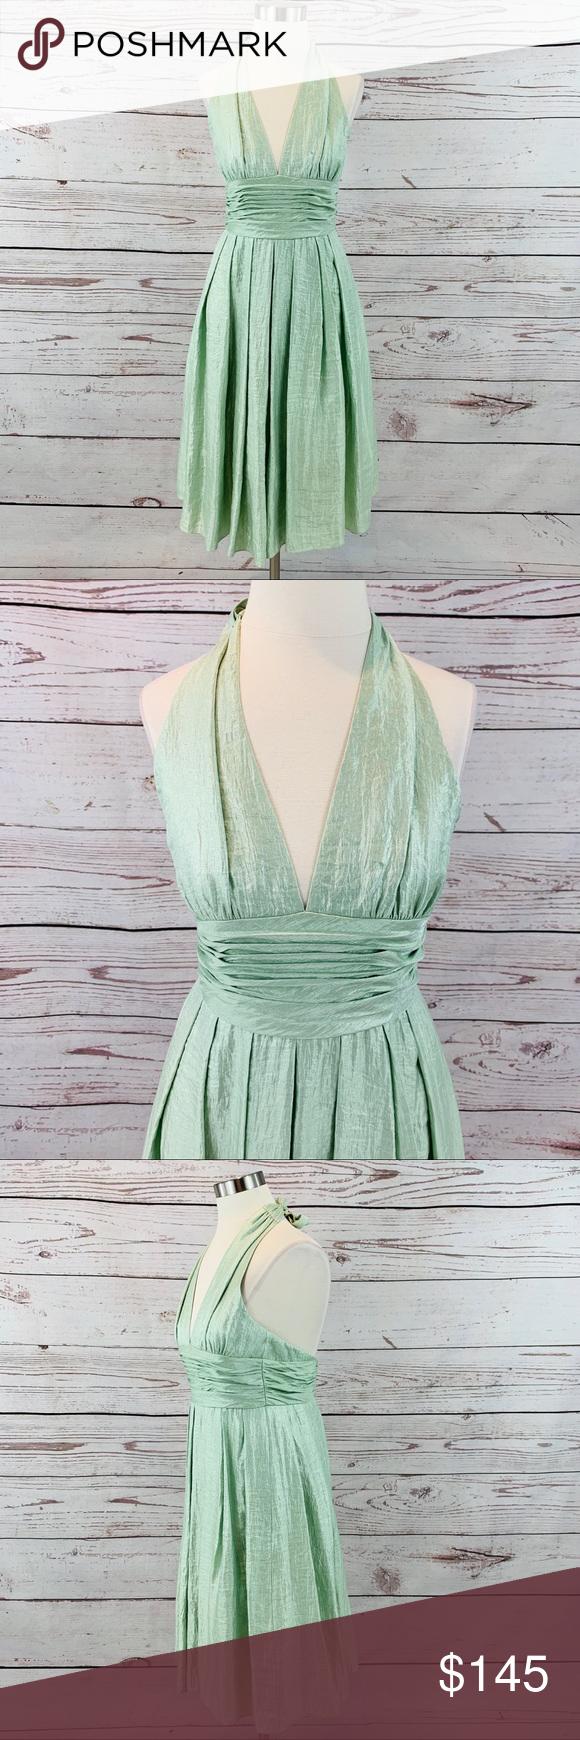 Adrianna Papell green halter neck sparkling dress Adrianna ...